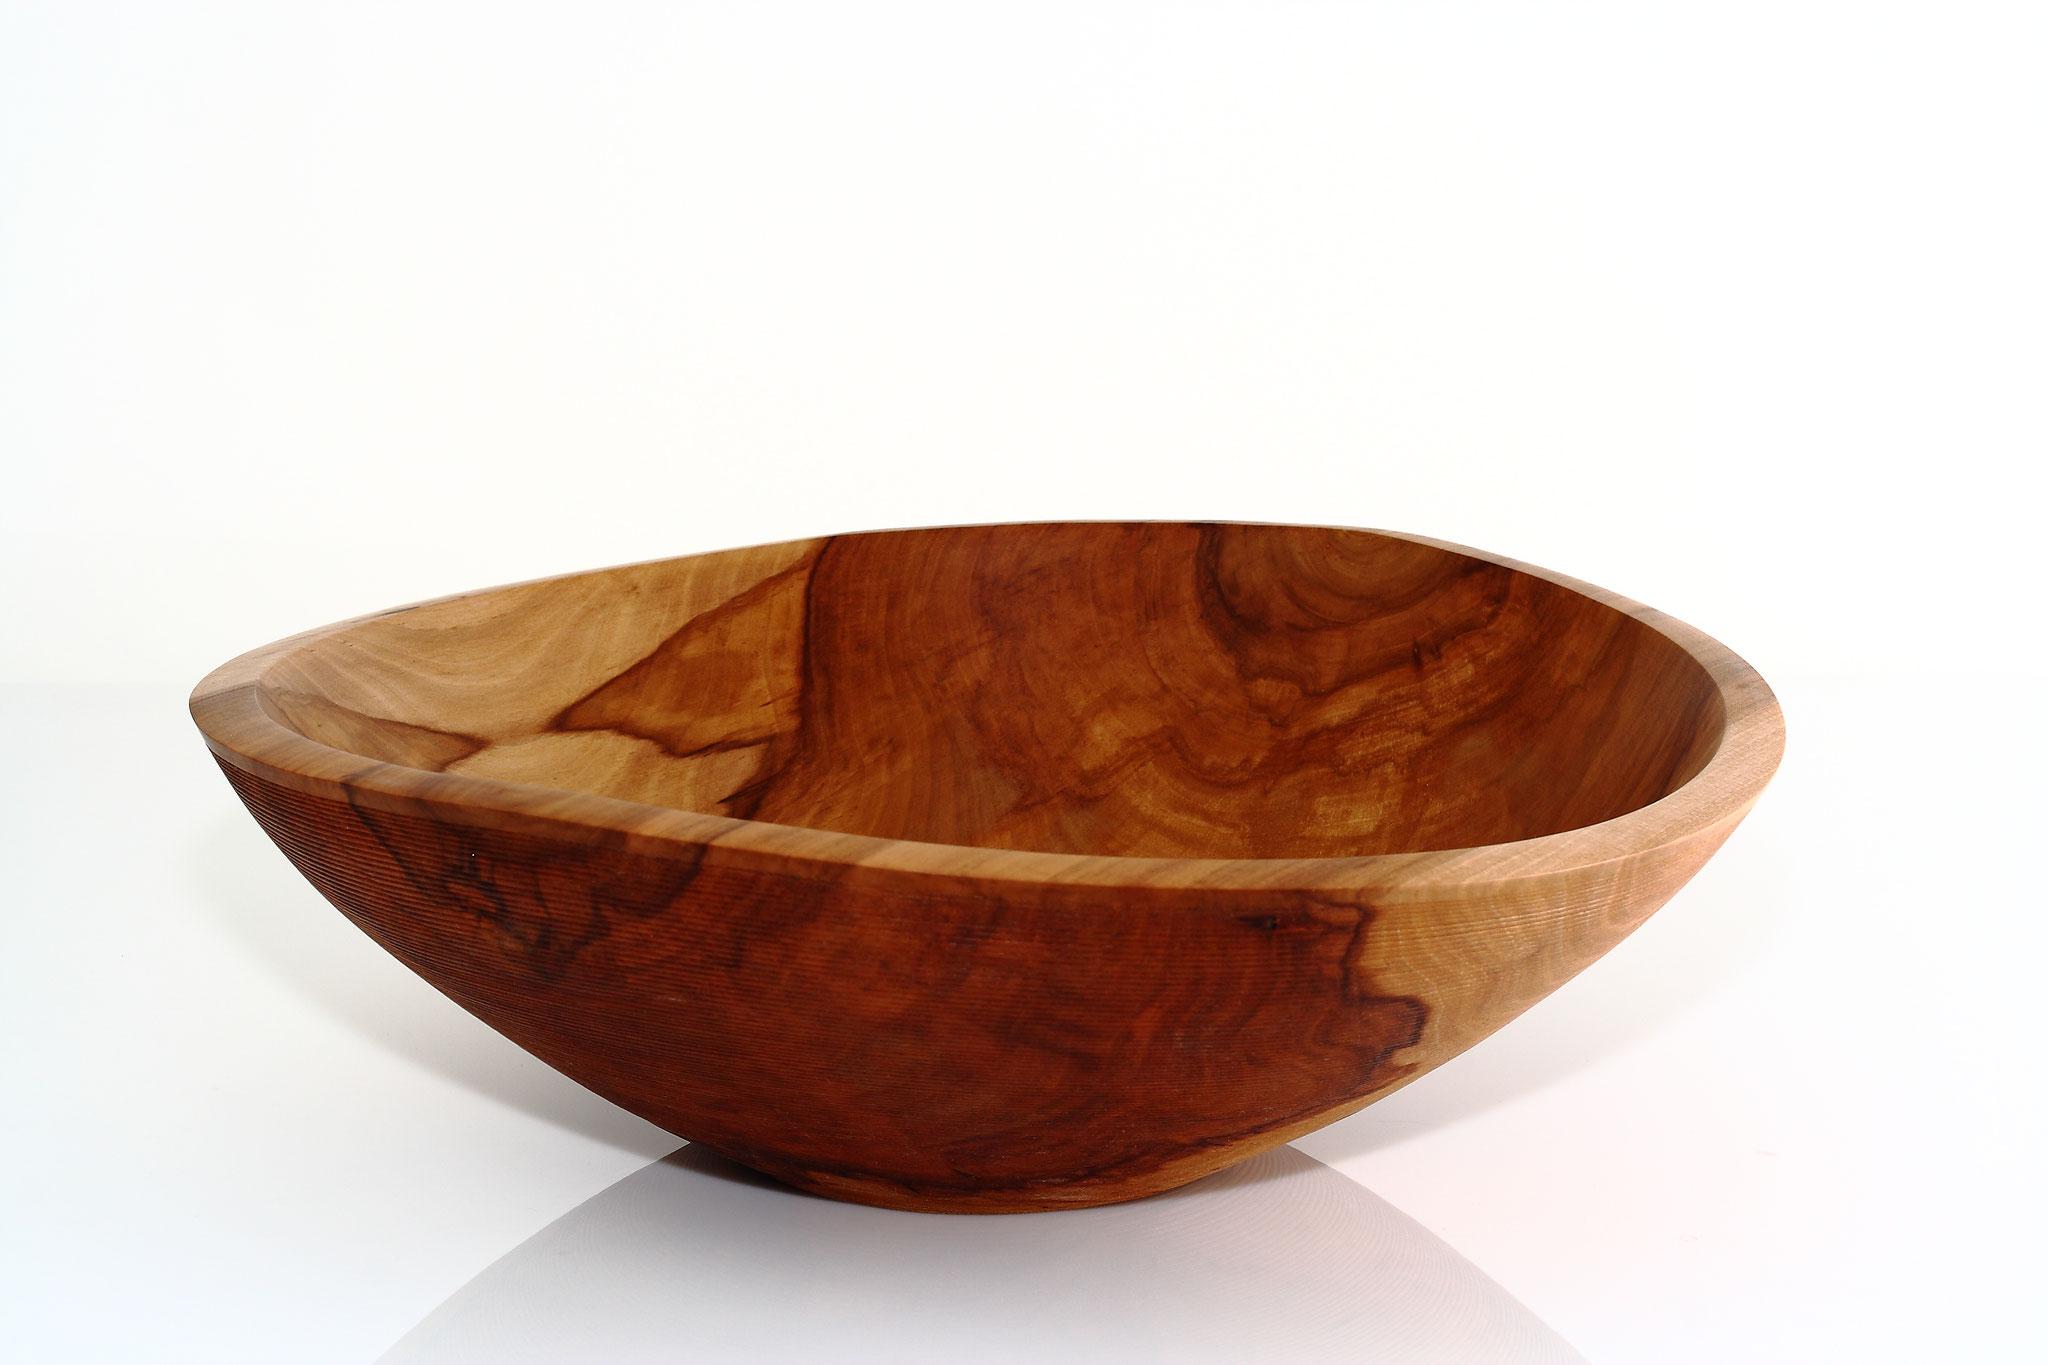 Schale aus Apfelholz